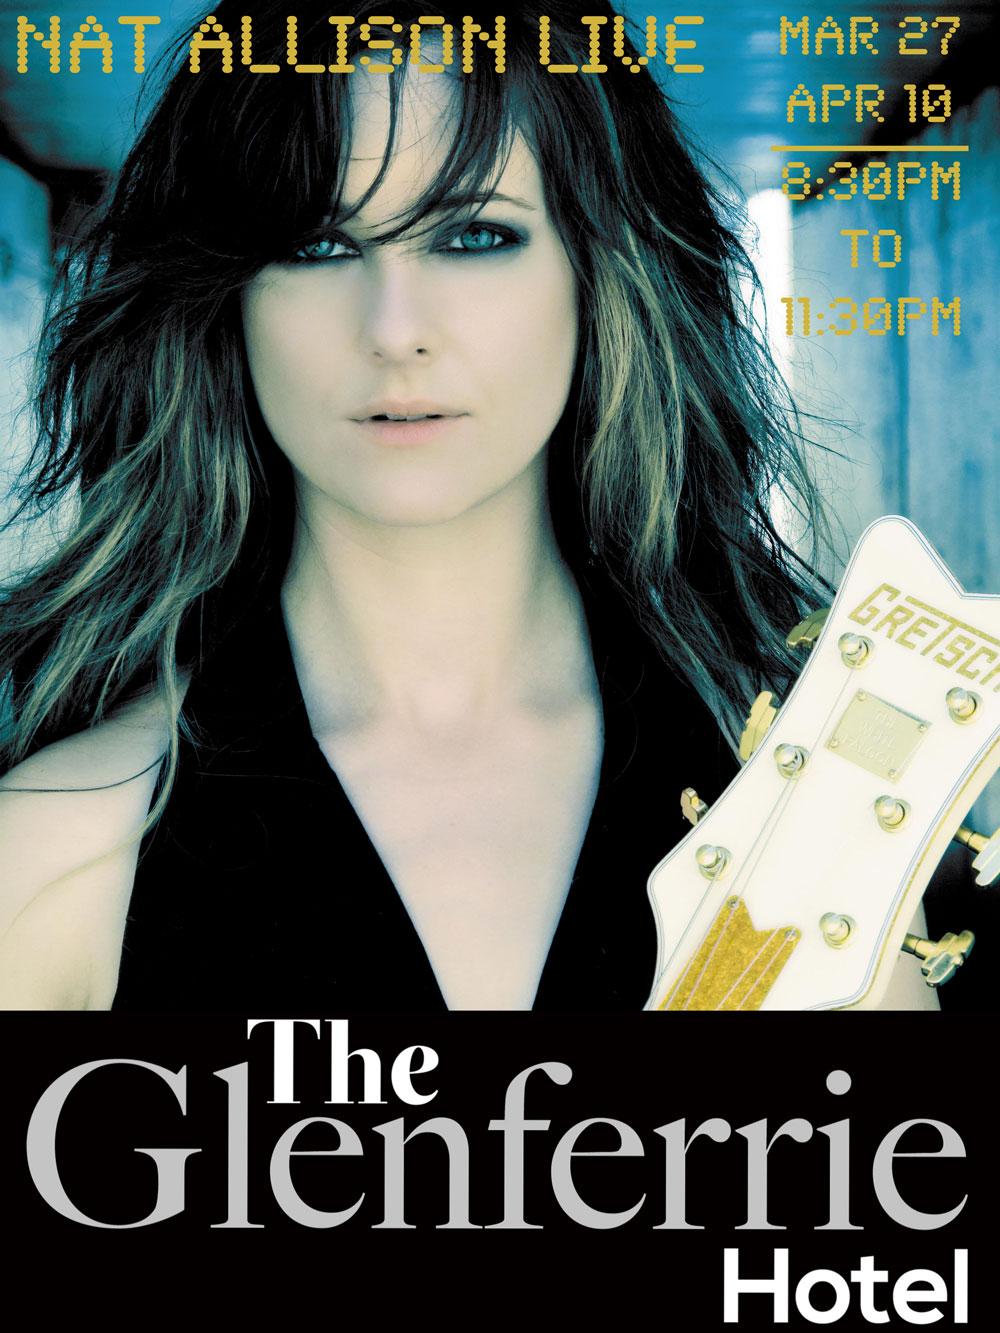 nat allison live at the glenferrie hotel